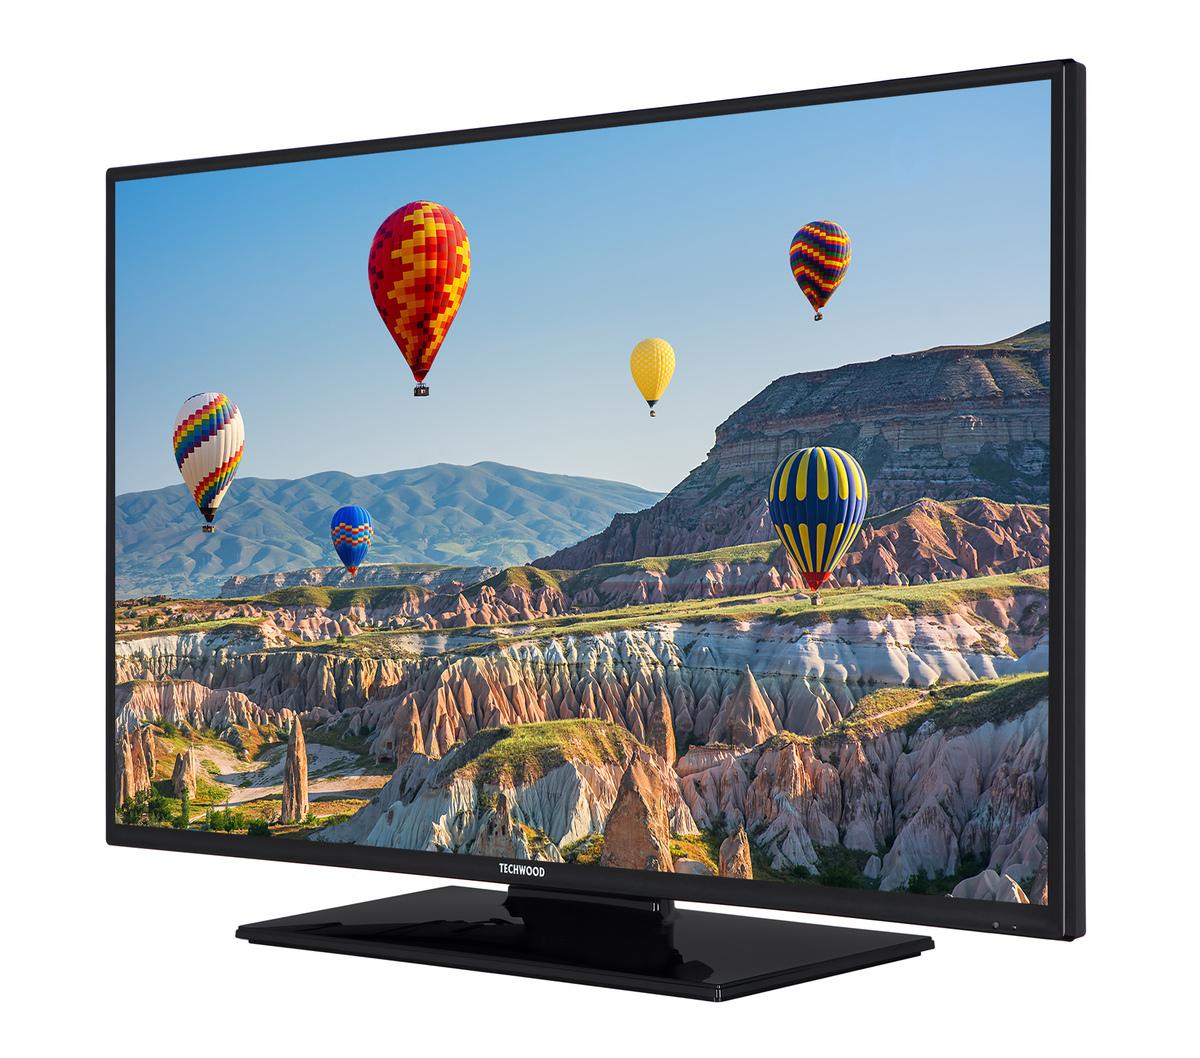 "Bild 2 von Techwood LED TV 40"" (102 cm)"